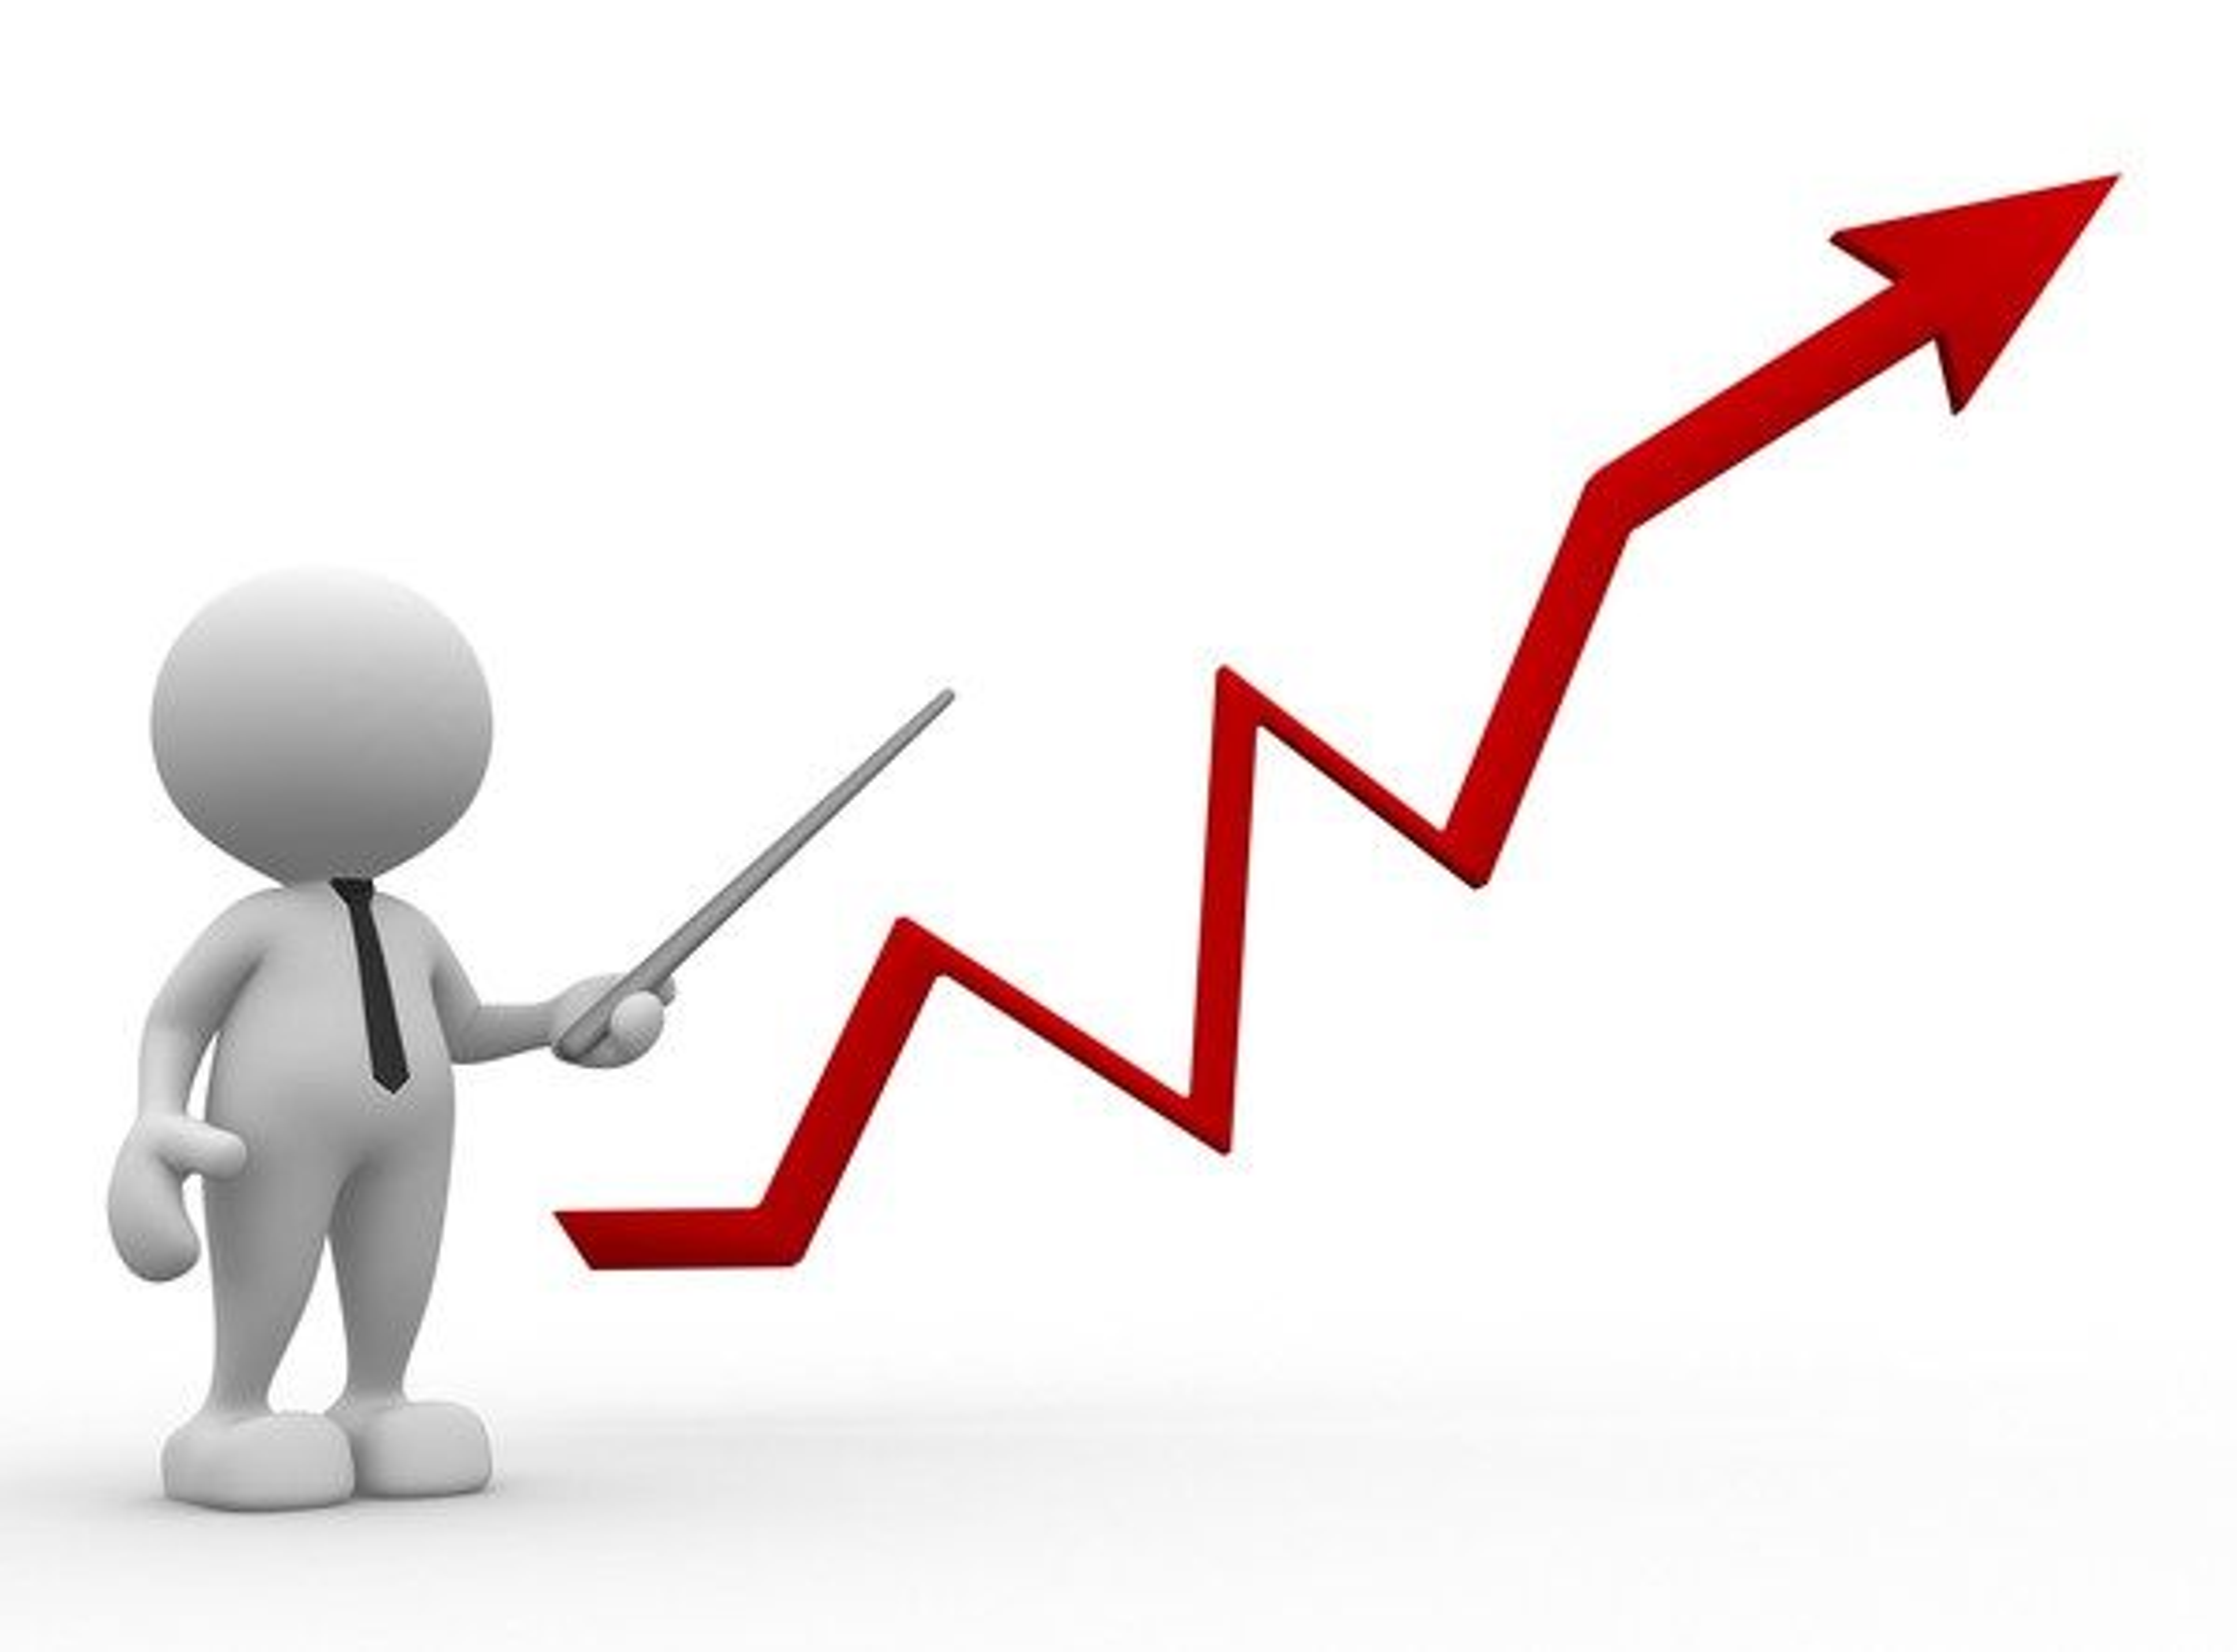 Explaining Why Stock Going Up